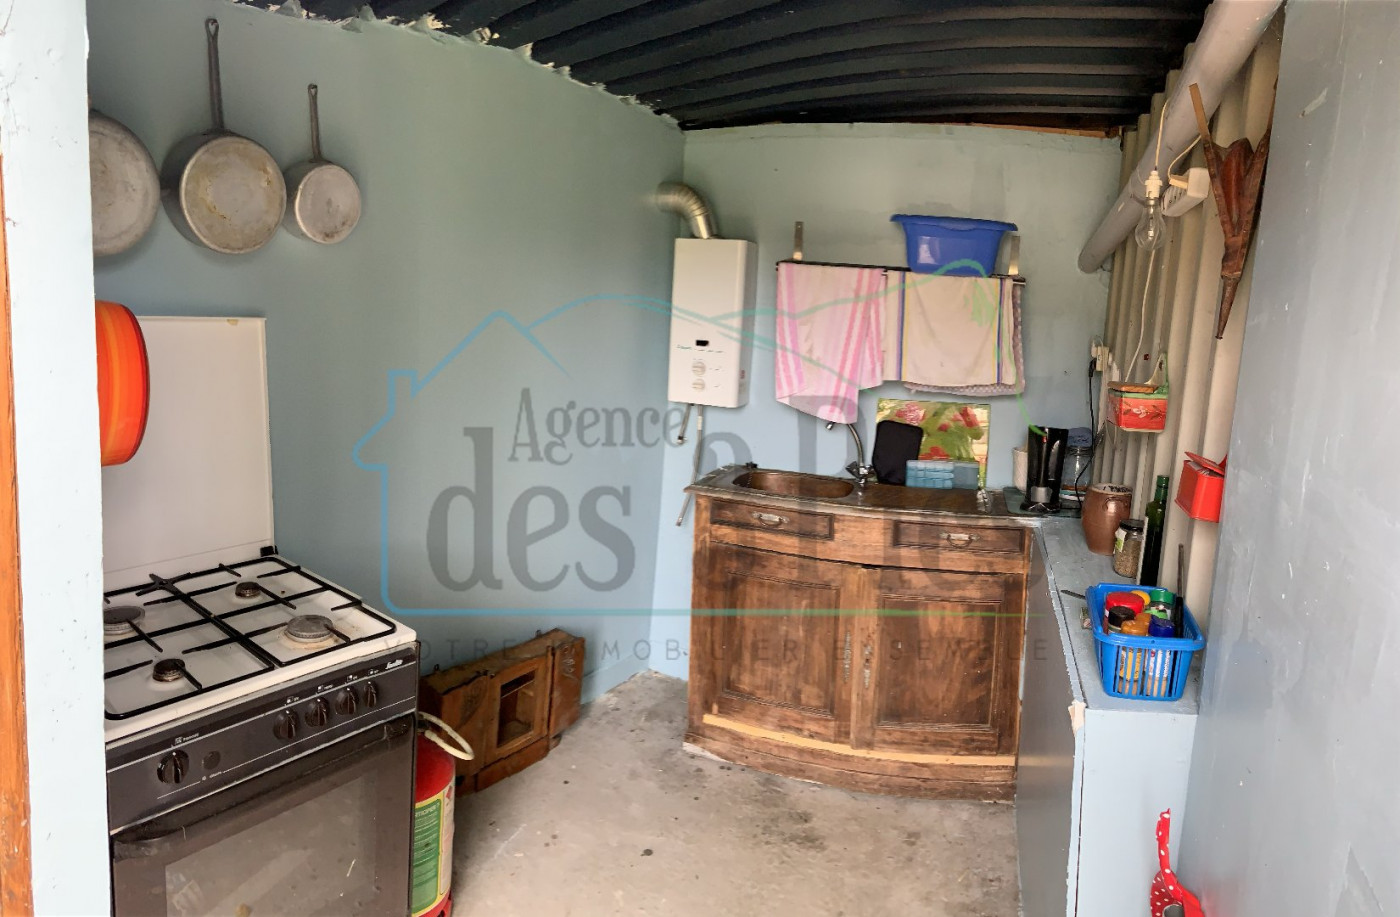 A vendre Taurignan Vieux 31238105 Agence des 3 pics